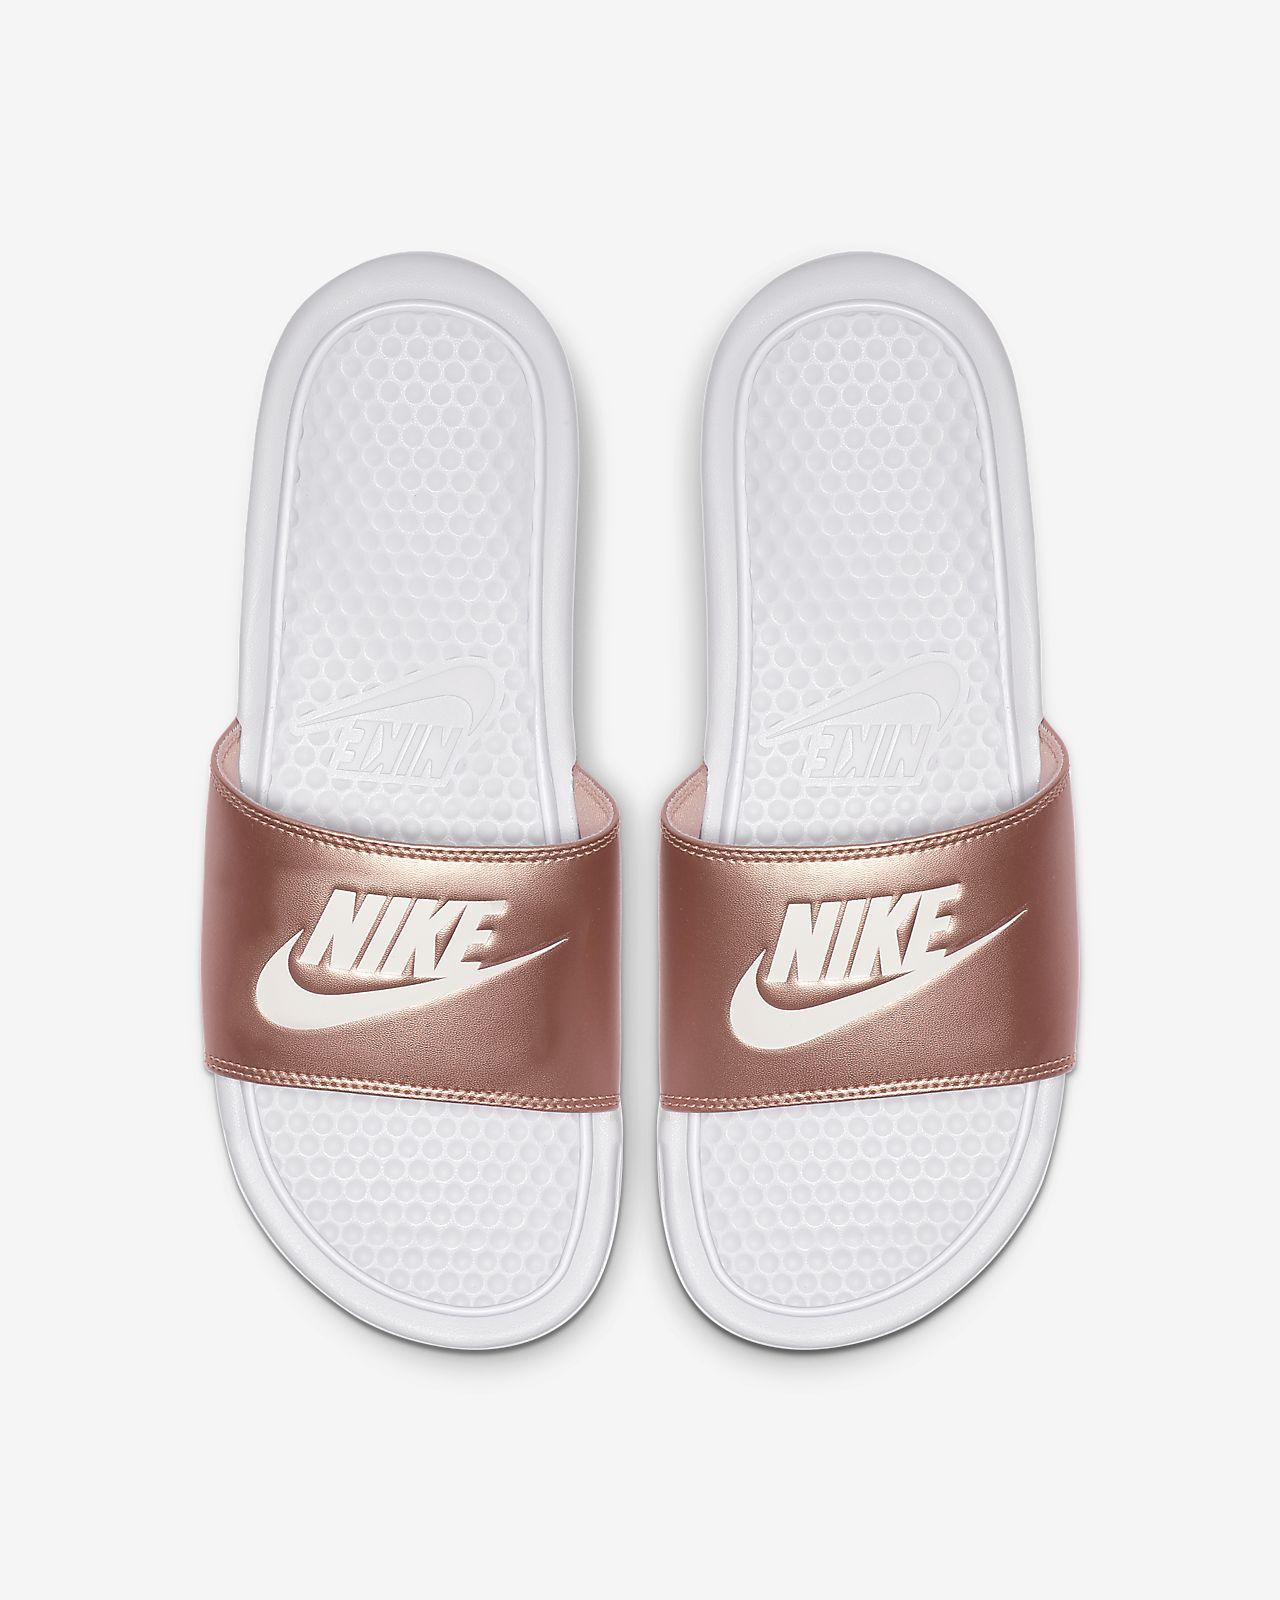 617ef4759ab0 Nike Benassi Women s Slide. Nike.com HU